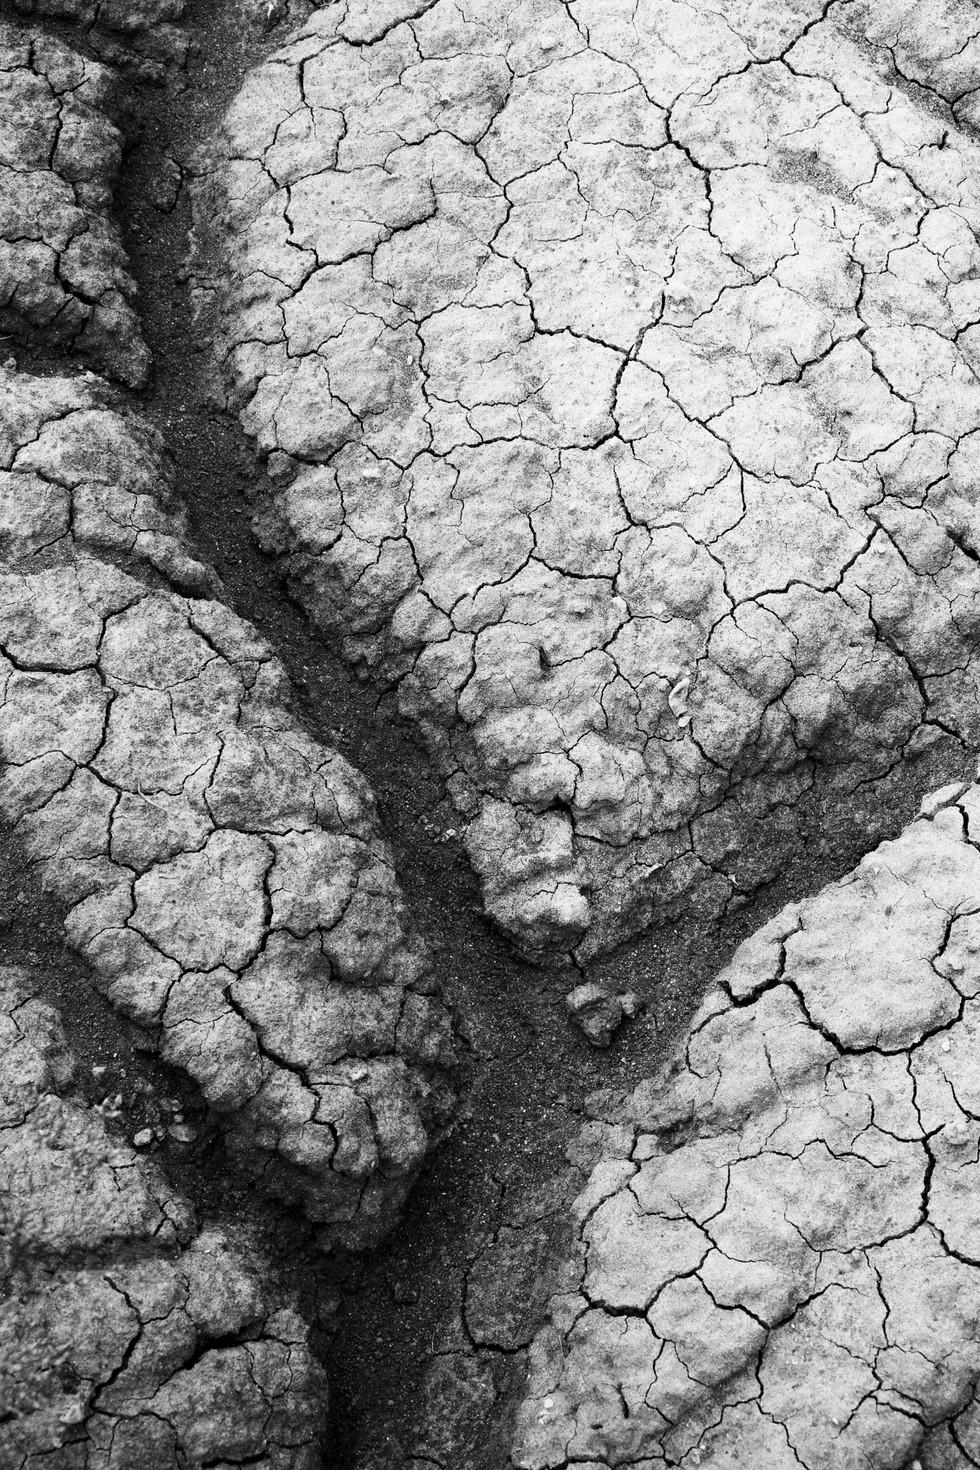 Dry Earth 1